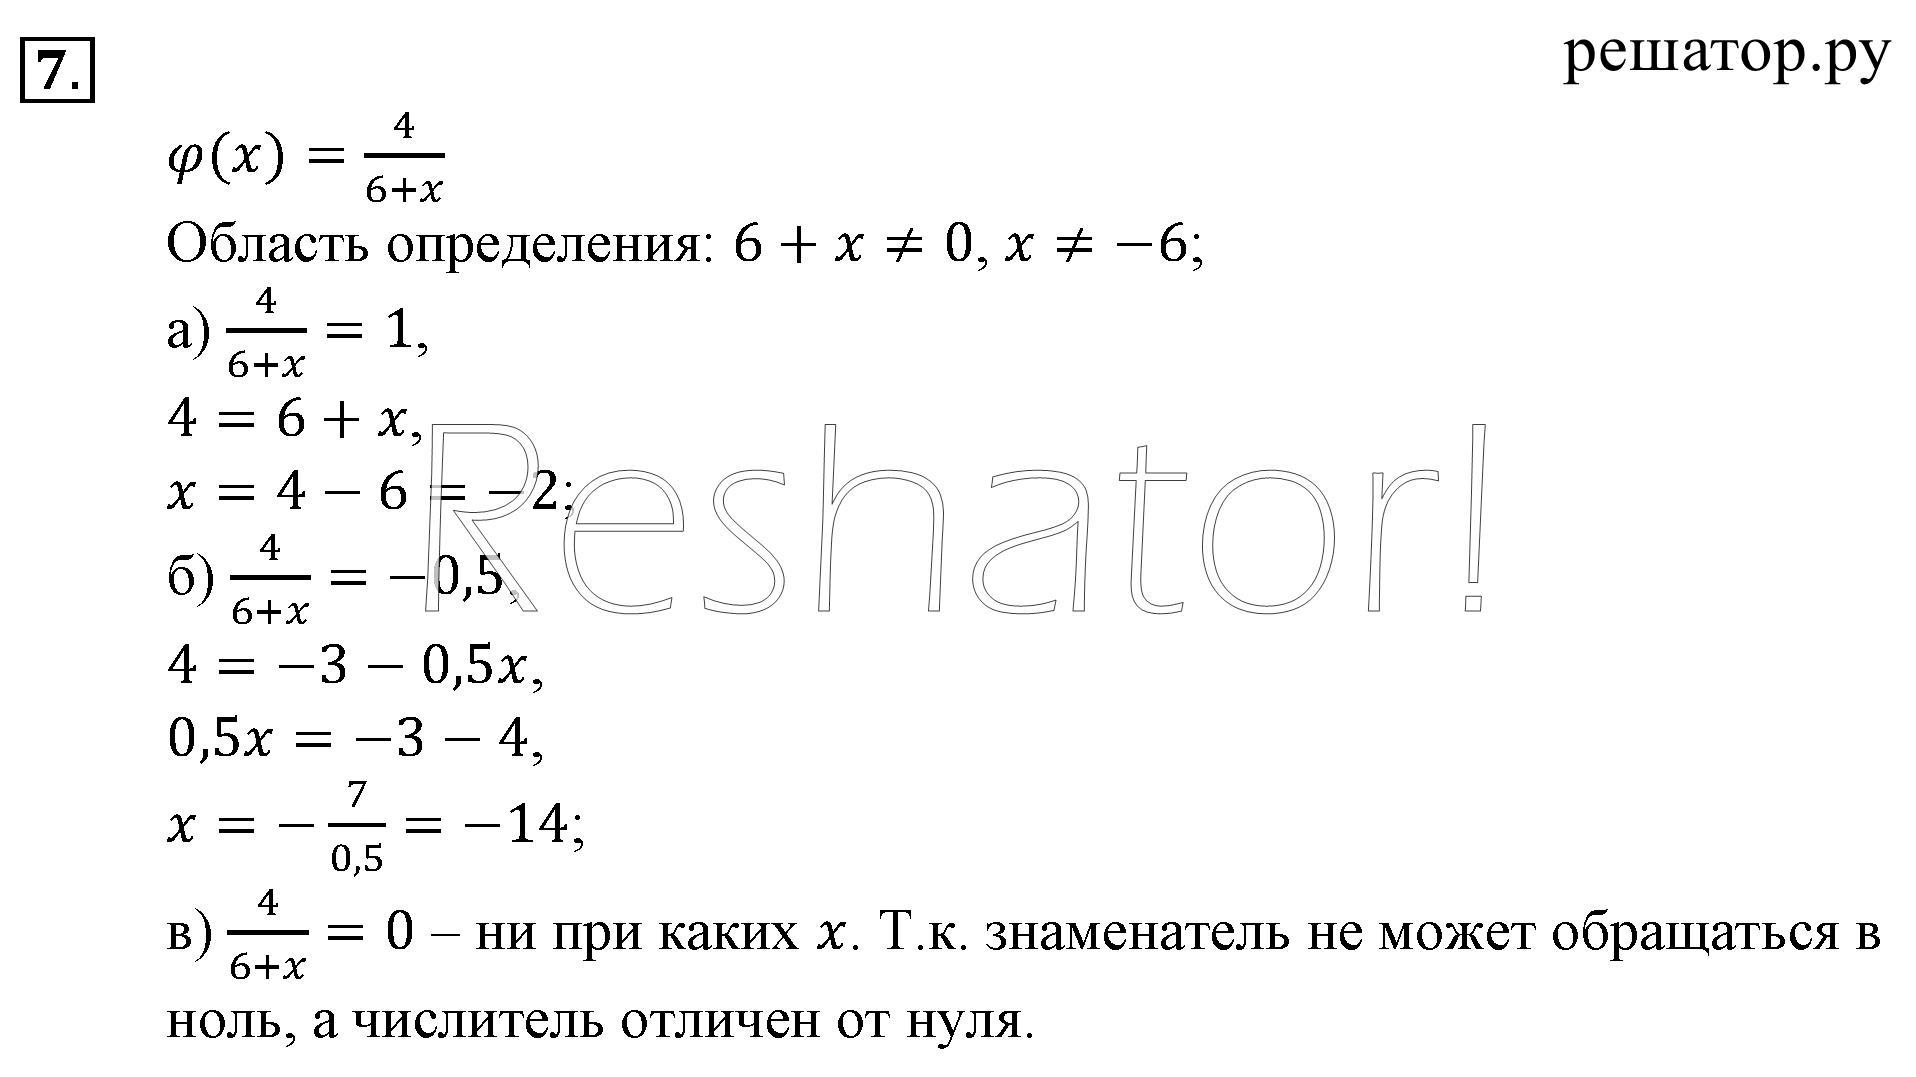 Гдз.макарычев-2018 год.9 класс онлайн